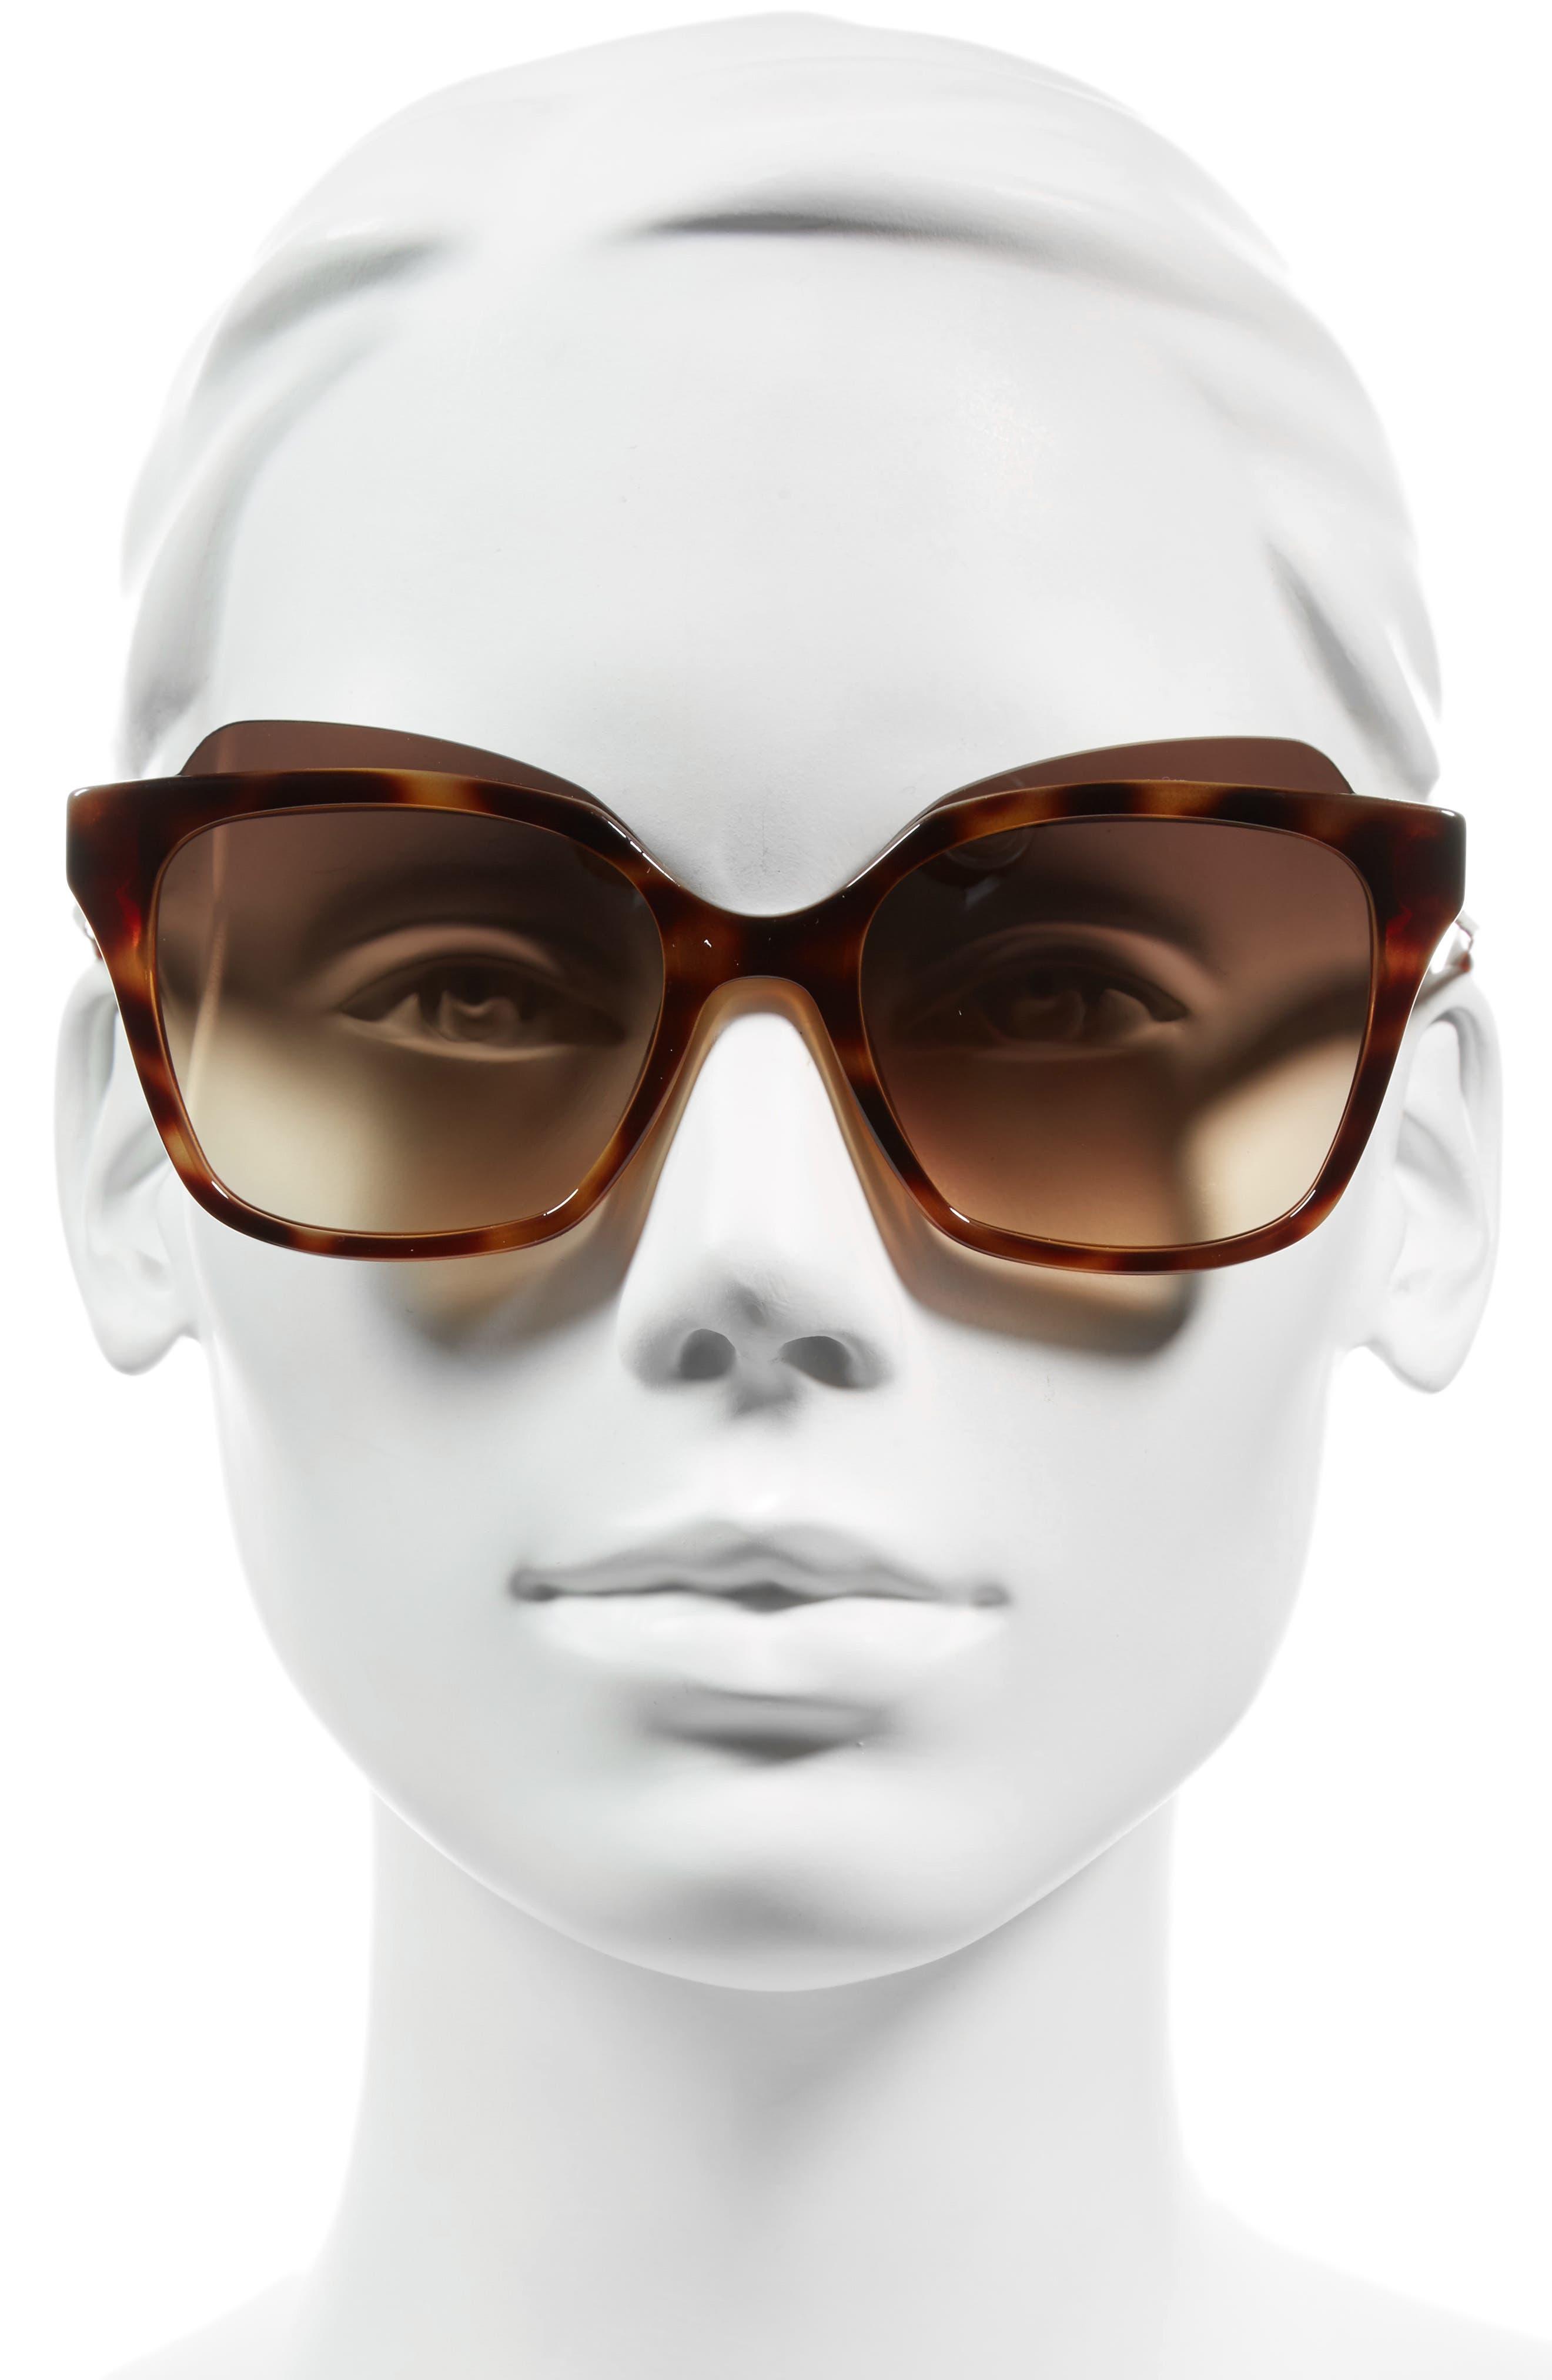 54mm Sunglasses,                             Alternate thumbnail 2, color,                             Havana